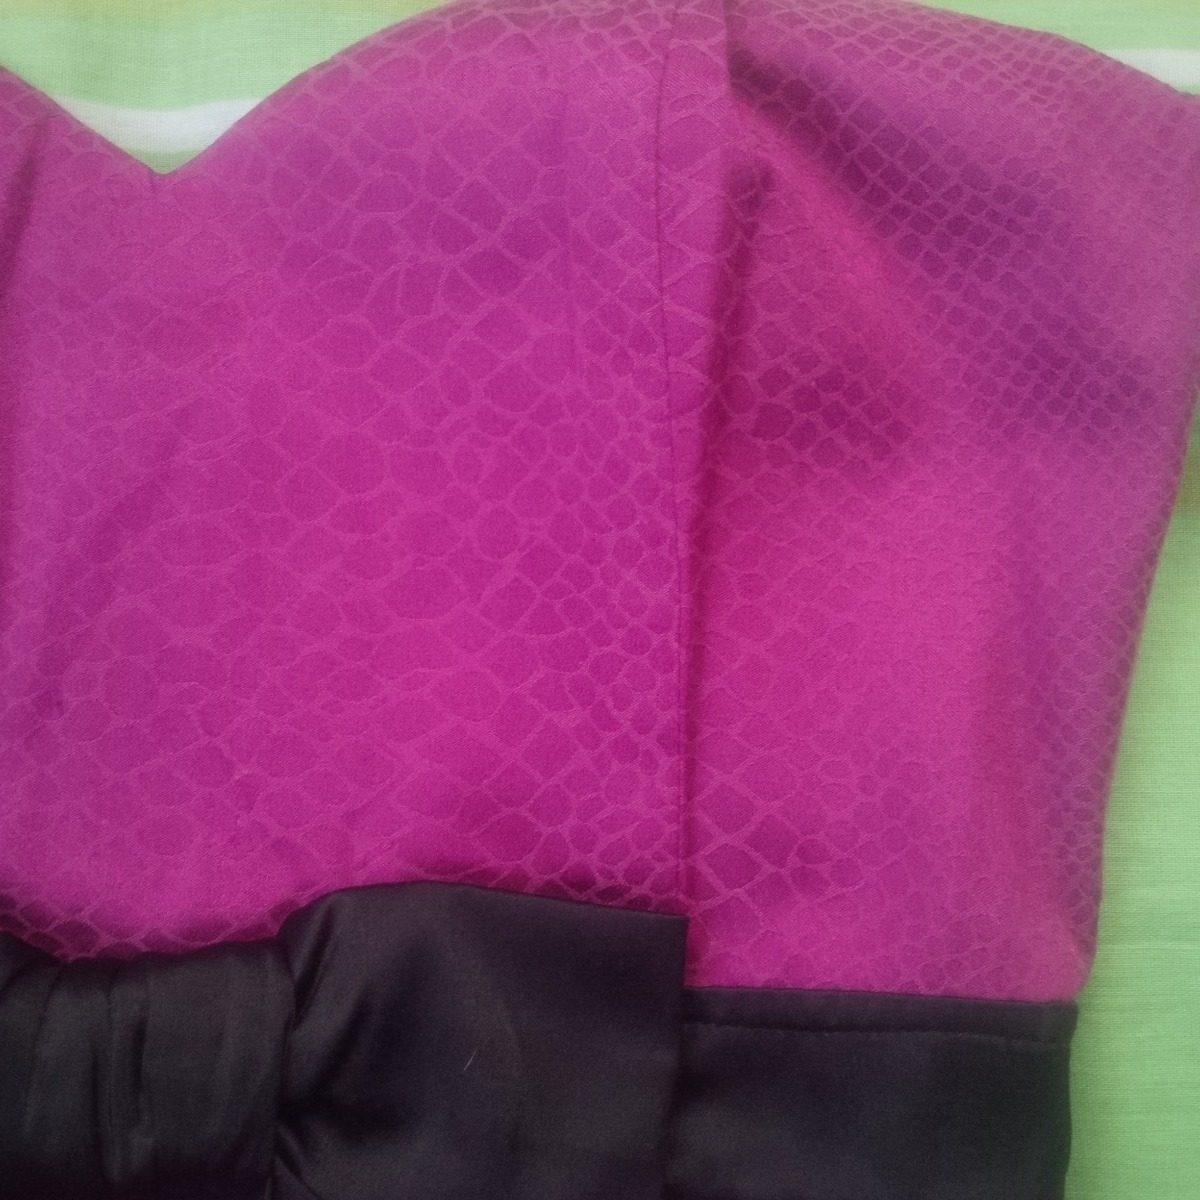 Vestido Largo Sirena Color Purpura Fiesta / Noche / Gala - Bs. 1.500 ...